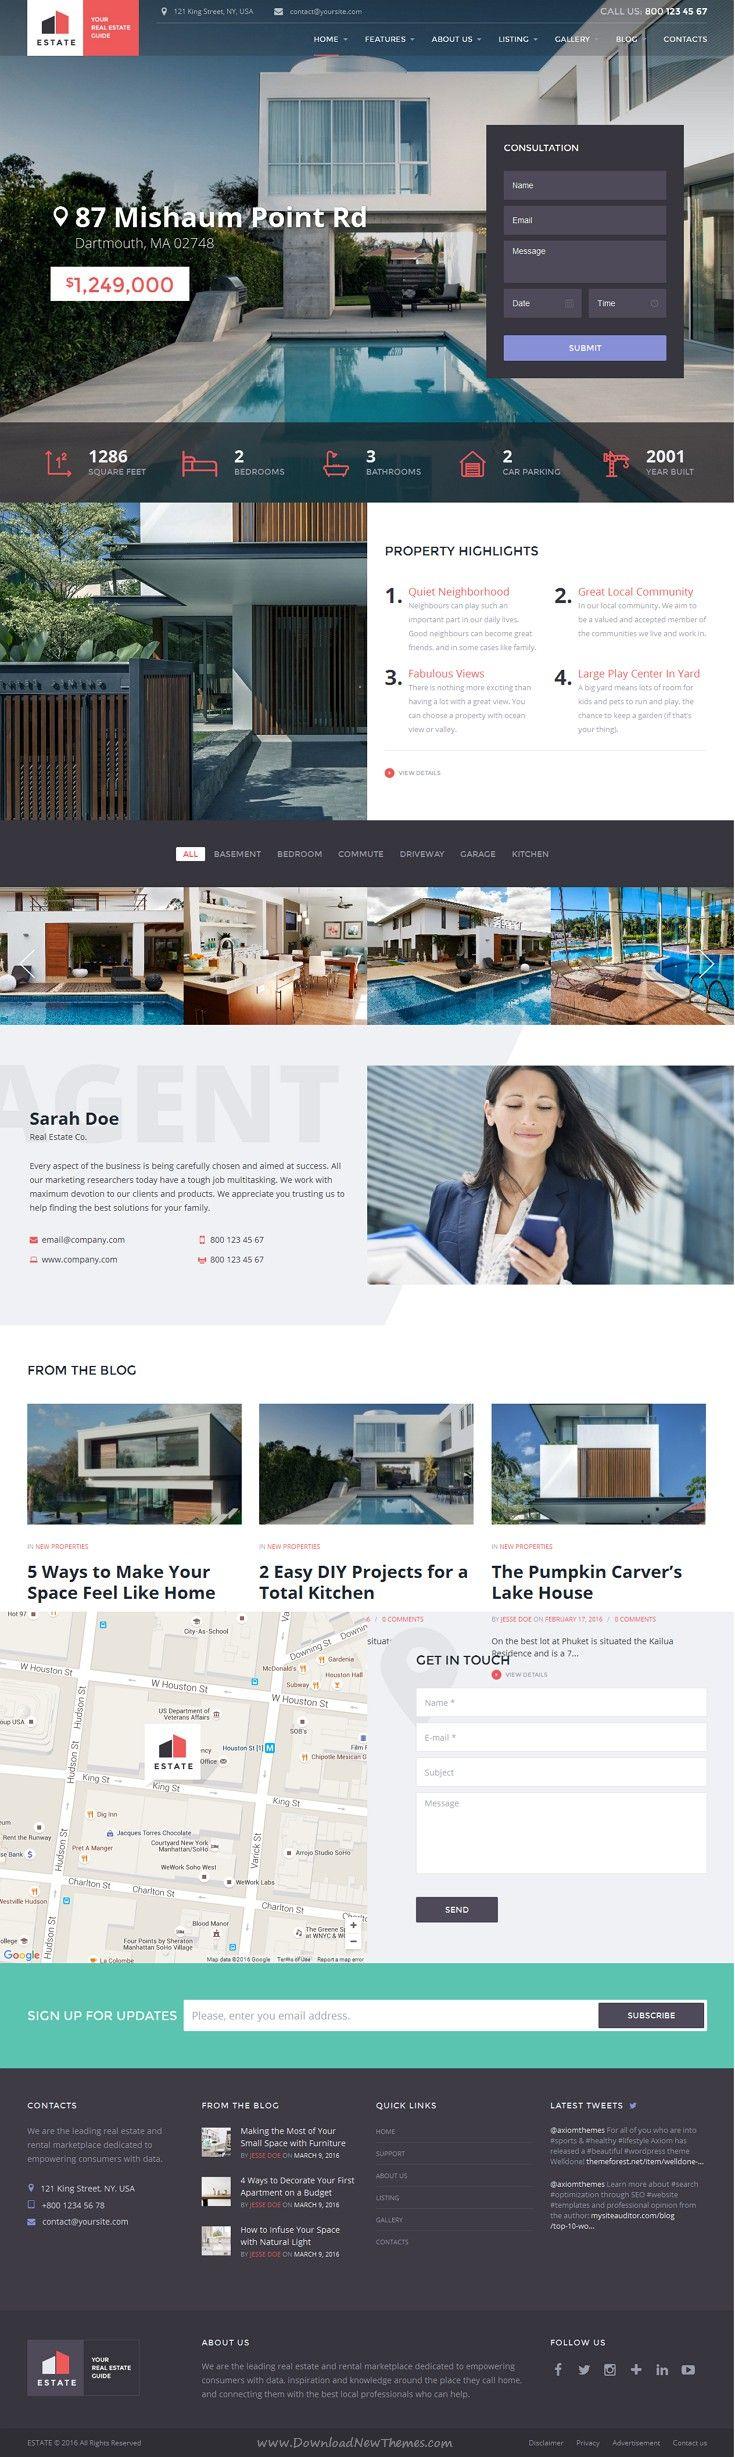 3503 best Best Website Designs images on Pinterest | Page layout ...